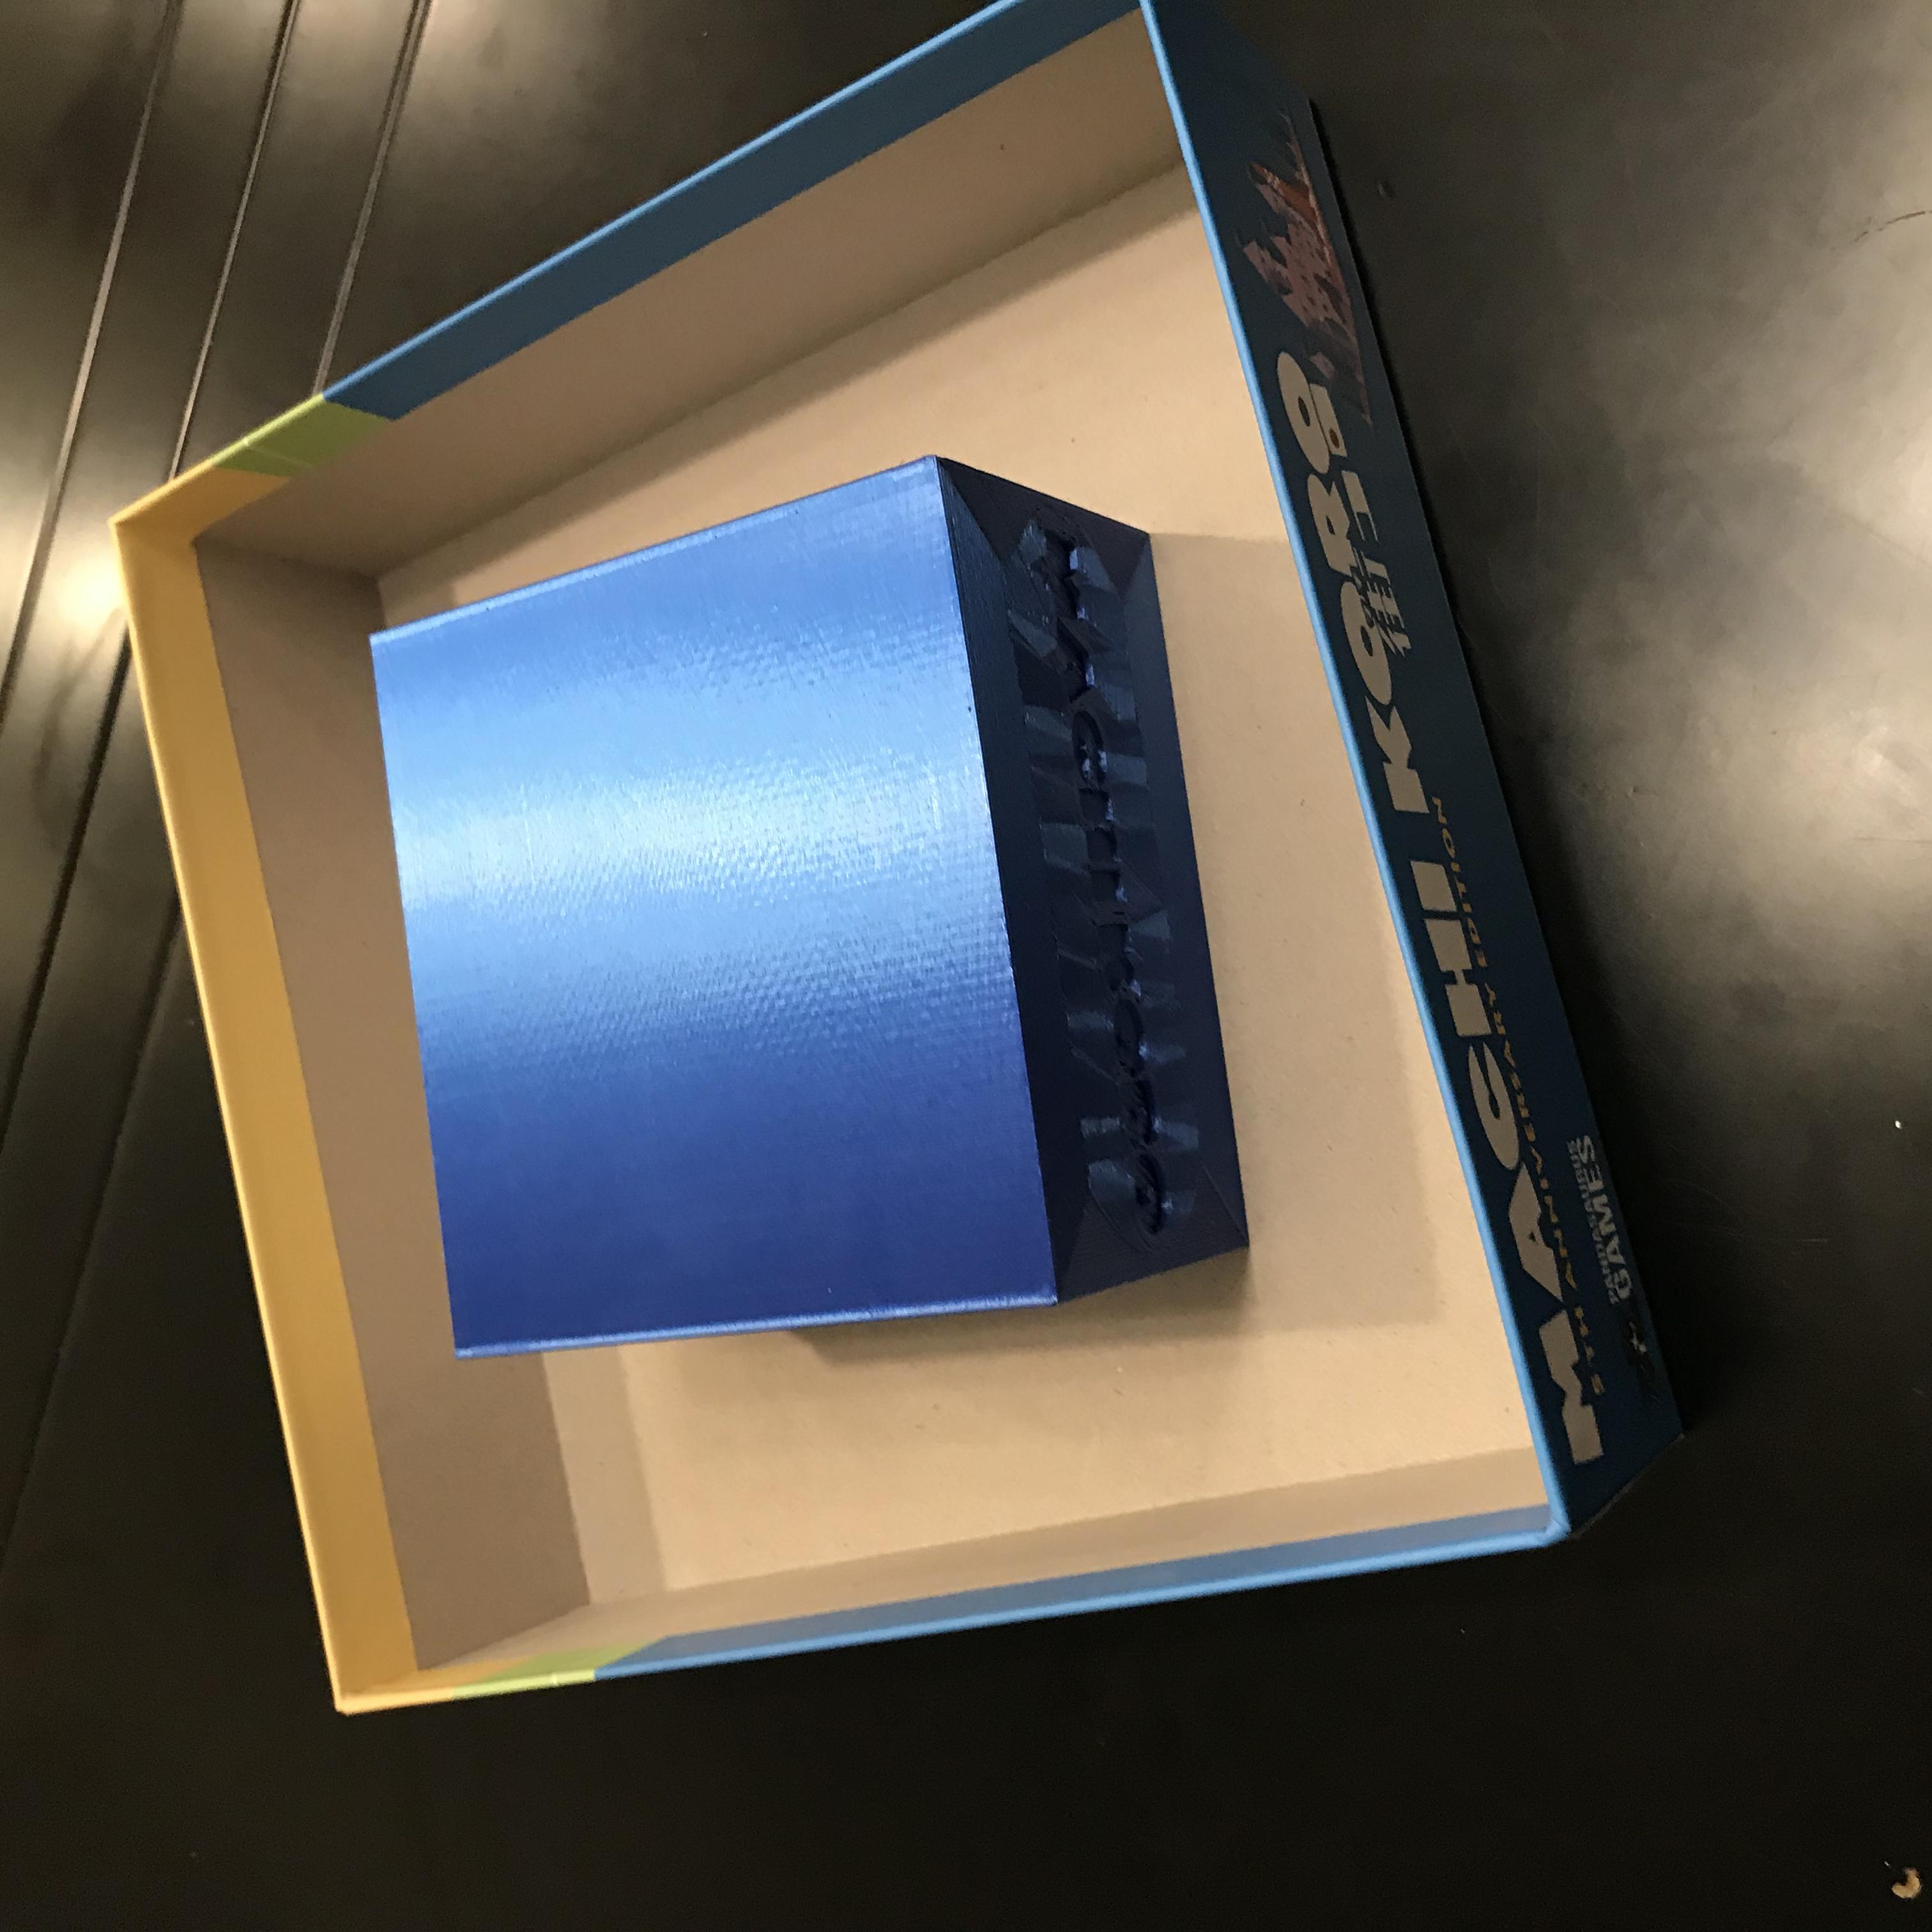 2019-09-21_10.18.40.jpg Download free STL file Machi Koro 5th Anniversary Edition Case • 3D printing template, Hardcore3D